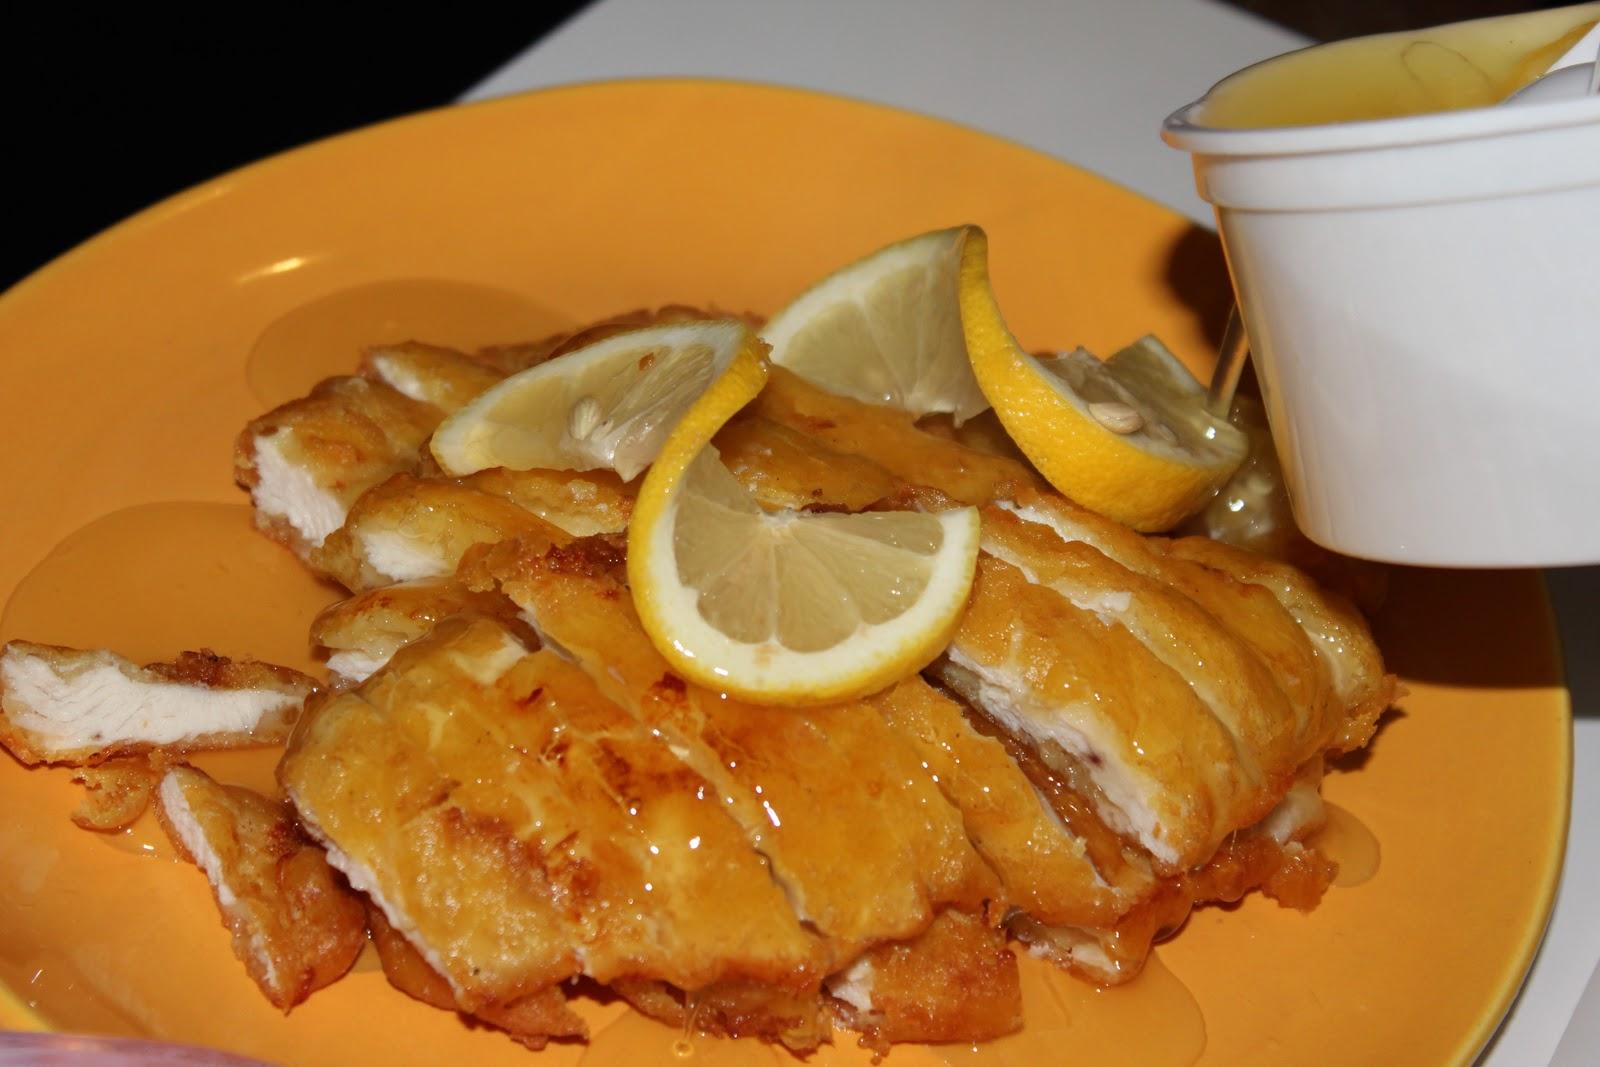 Cocinando en zapatillas pollo al limon estilo chino - Salsa de pollo al limon ...